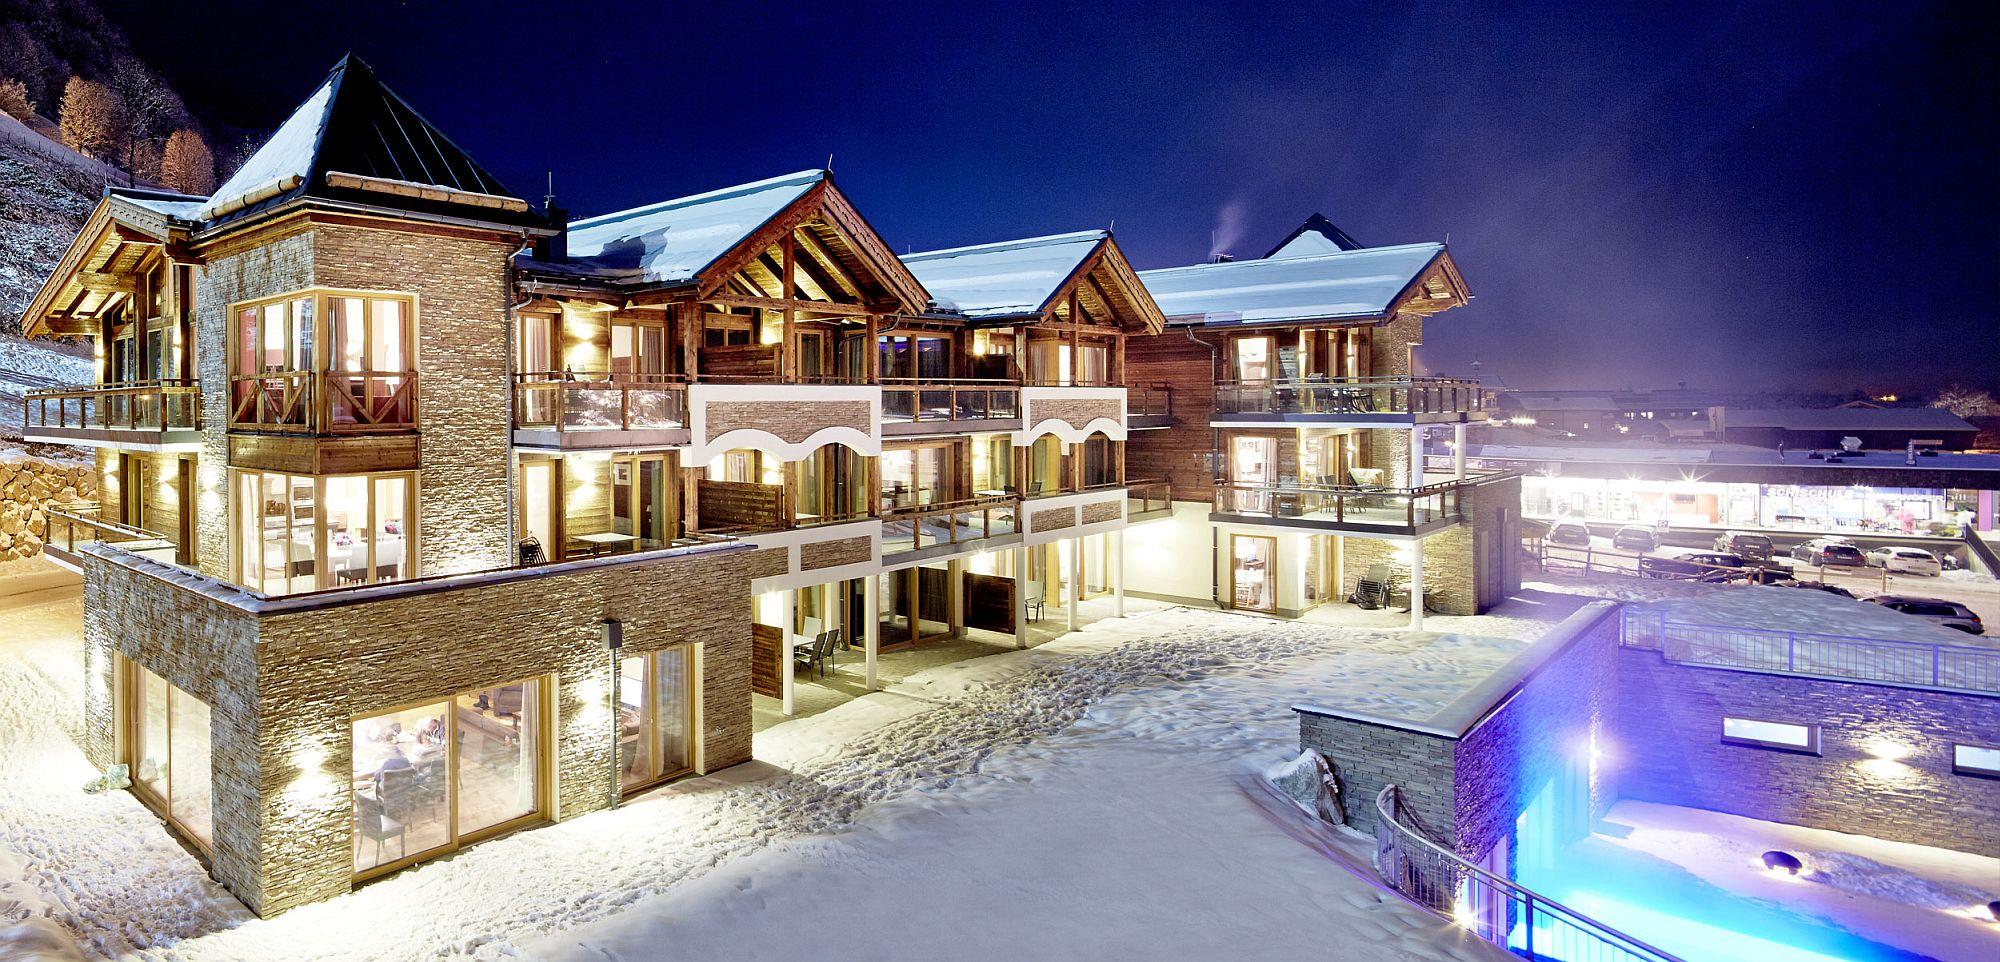 Relaxing-and-lavish-Wildkogel-Resort-in-Austria